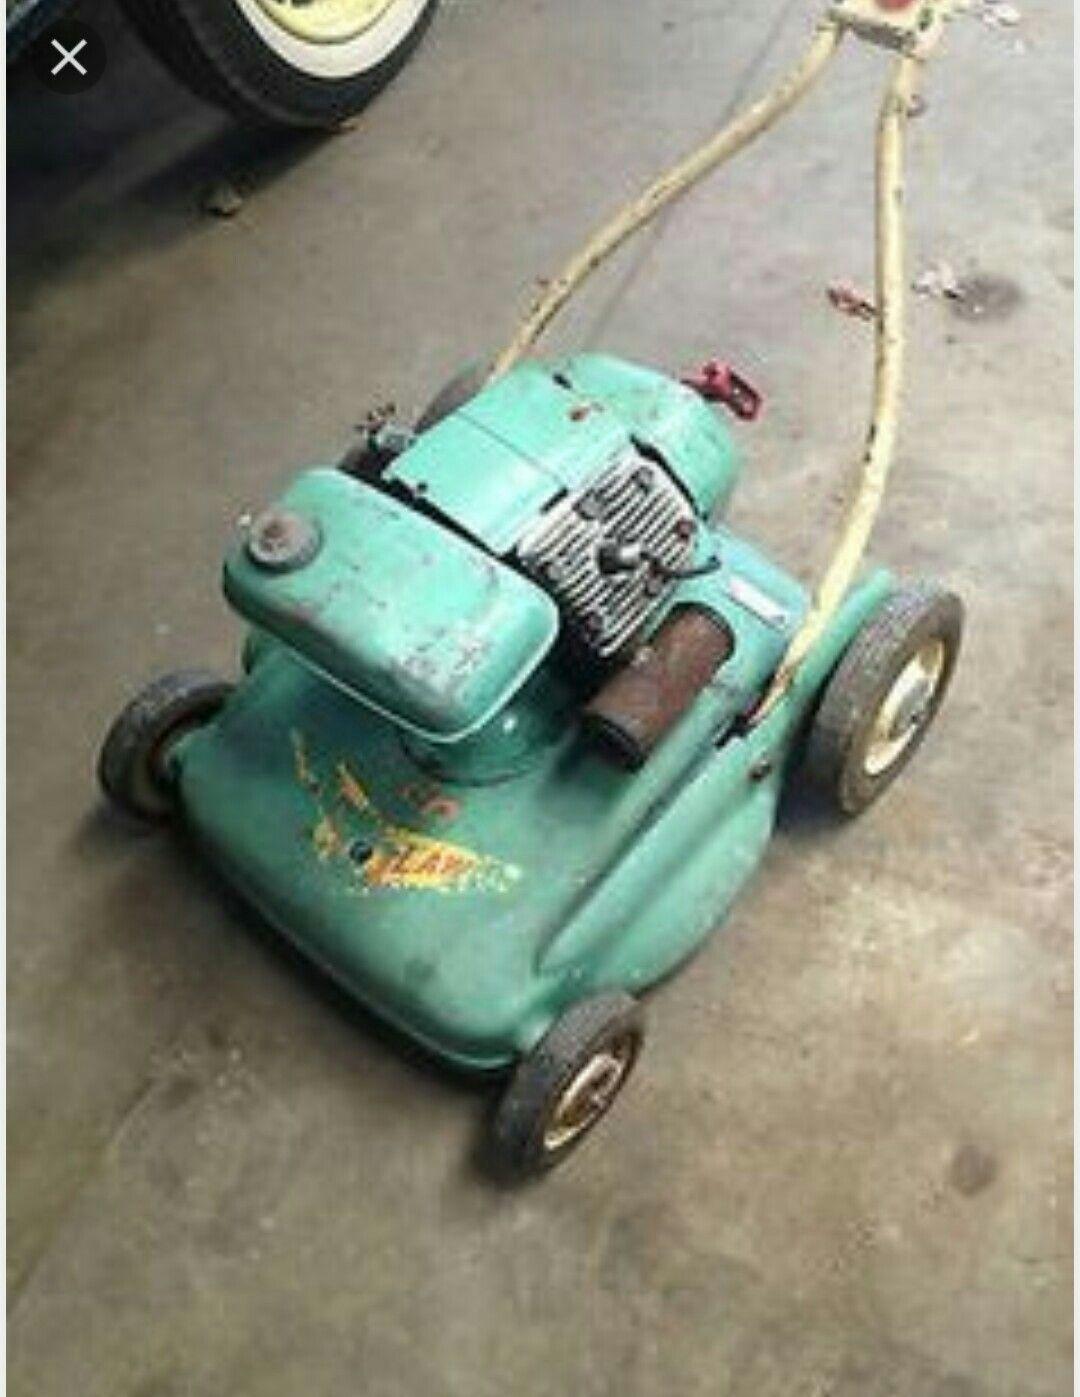 1959 Reo Pivotrim Rotary Lawn Mower Vintage Tractors Lawn Mower